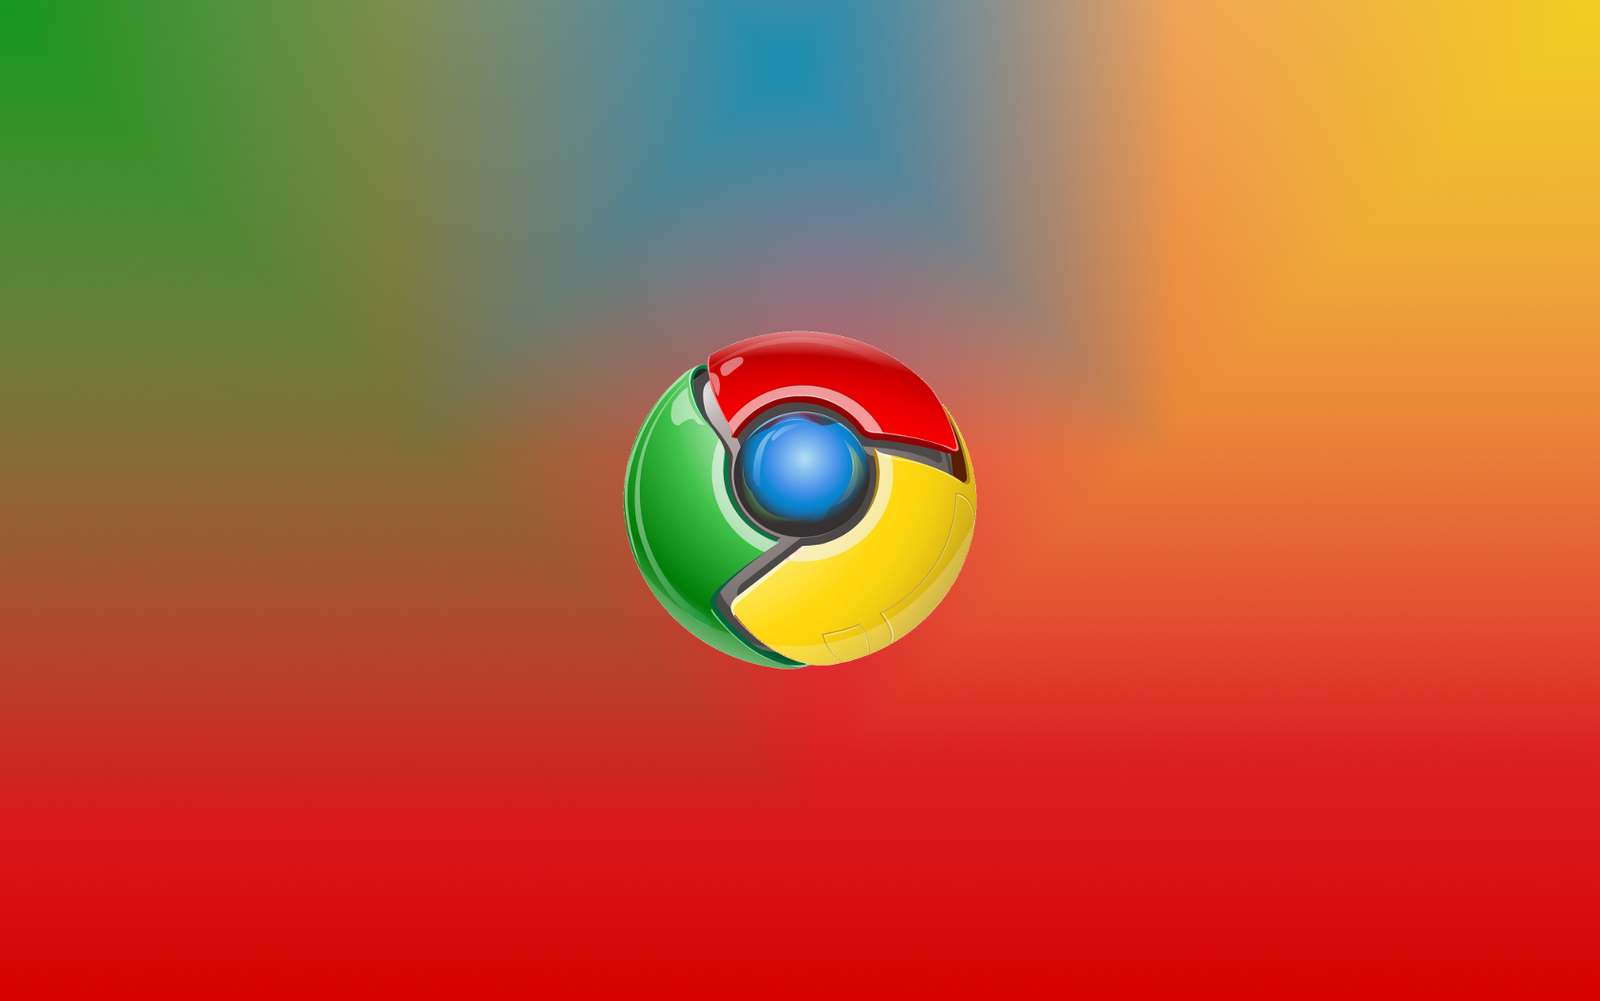 Wallpaper Naruto Google Chrome Download Wallpaper 1600x1001